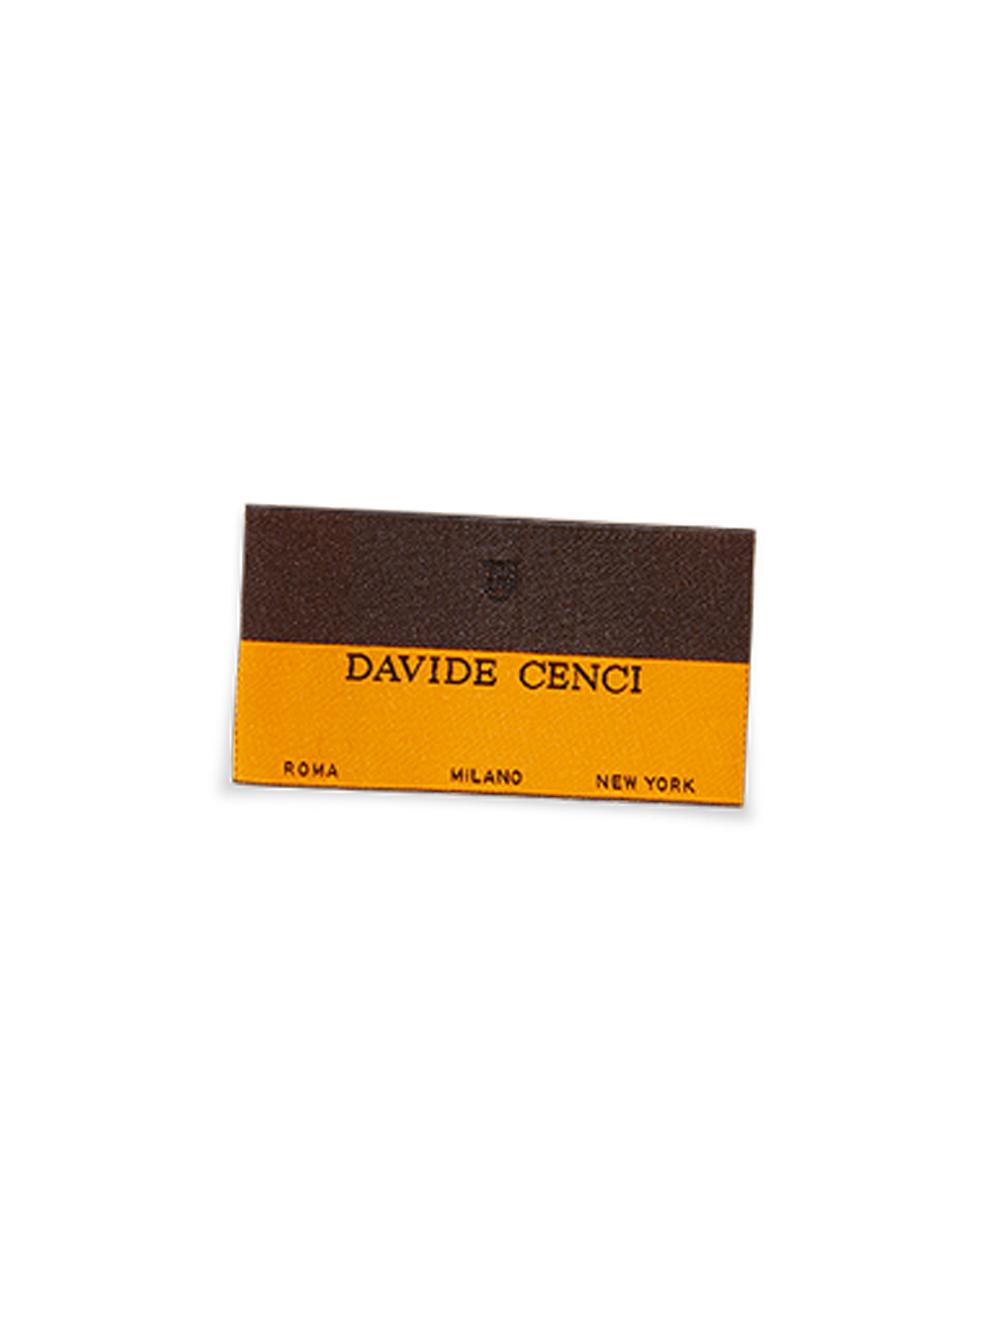 Dove-colored CampoMarzio5 model of men's five-pocket pants